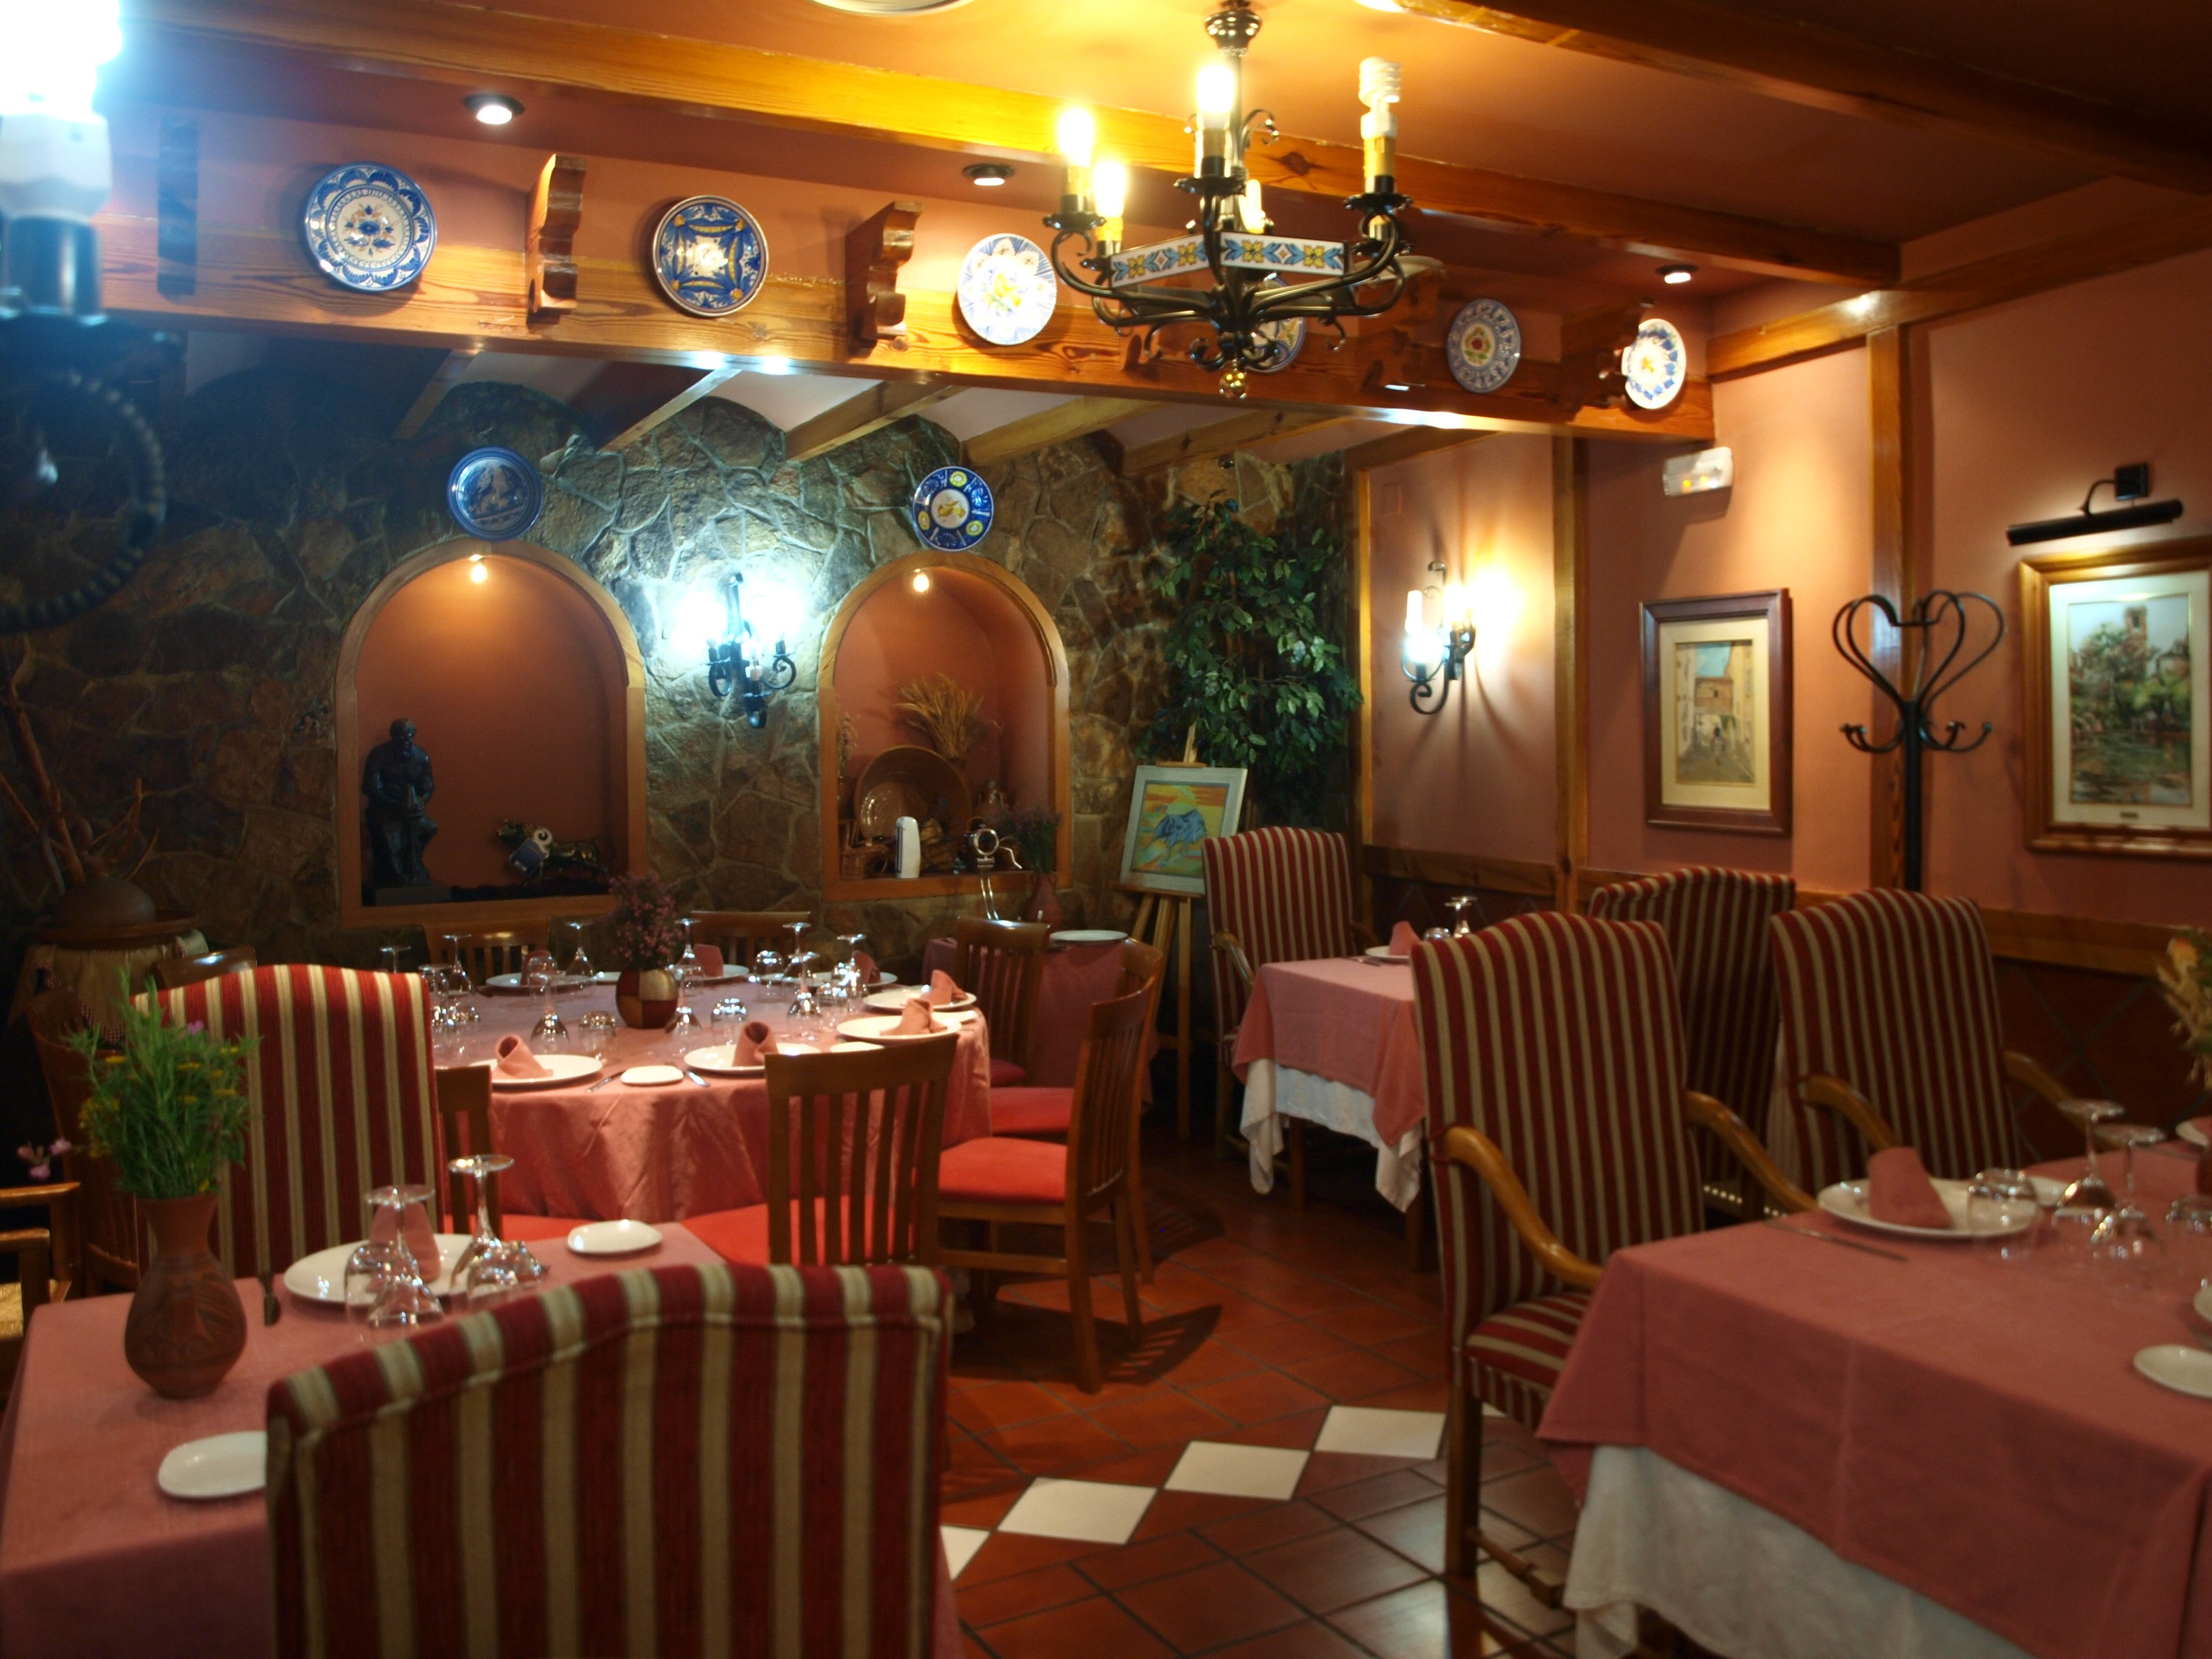 restaurante guia michelin